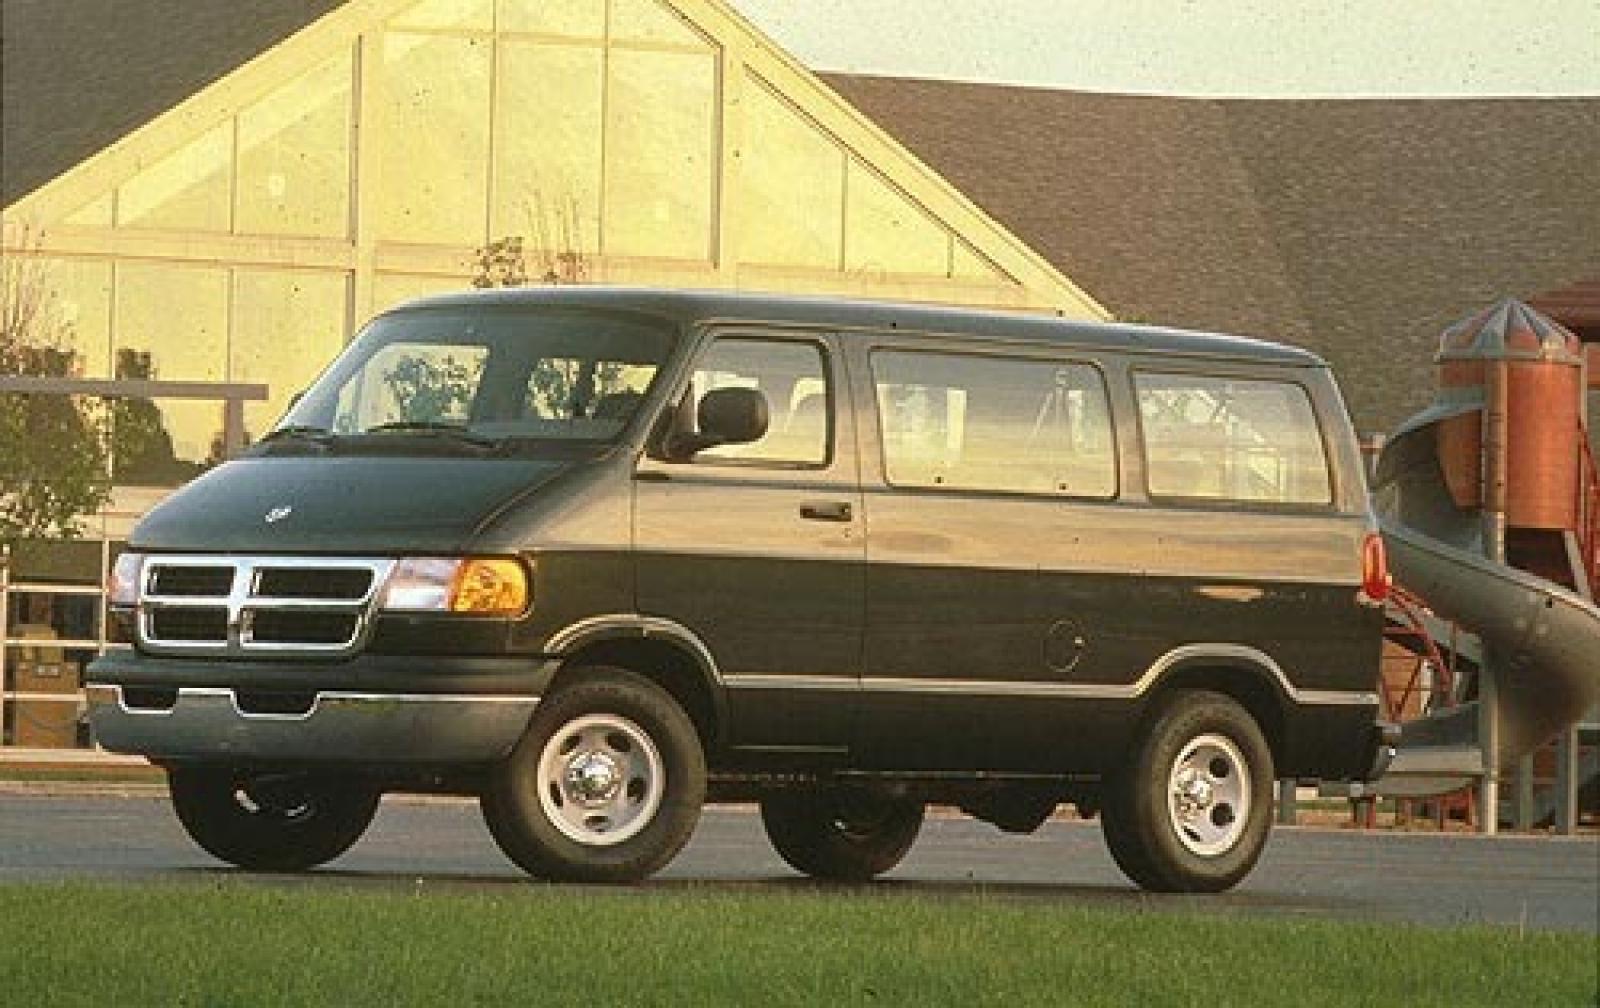 2002 Dodge Ram Wagon - Information and photos - Zomb Drive